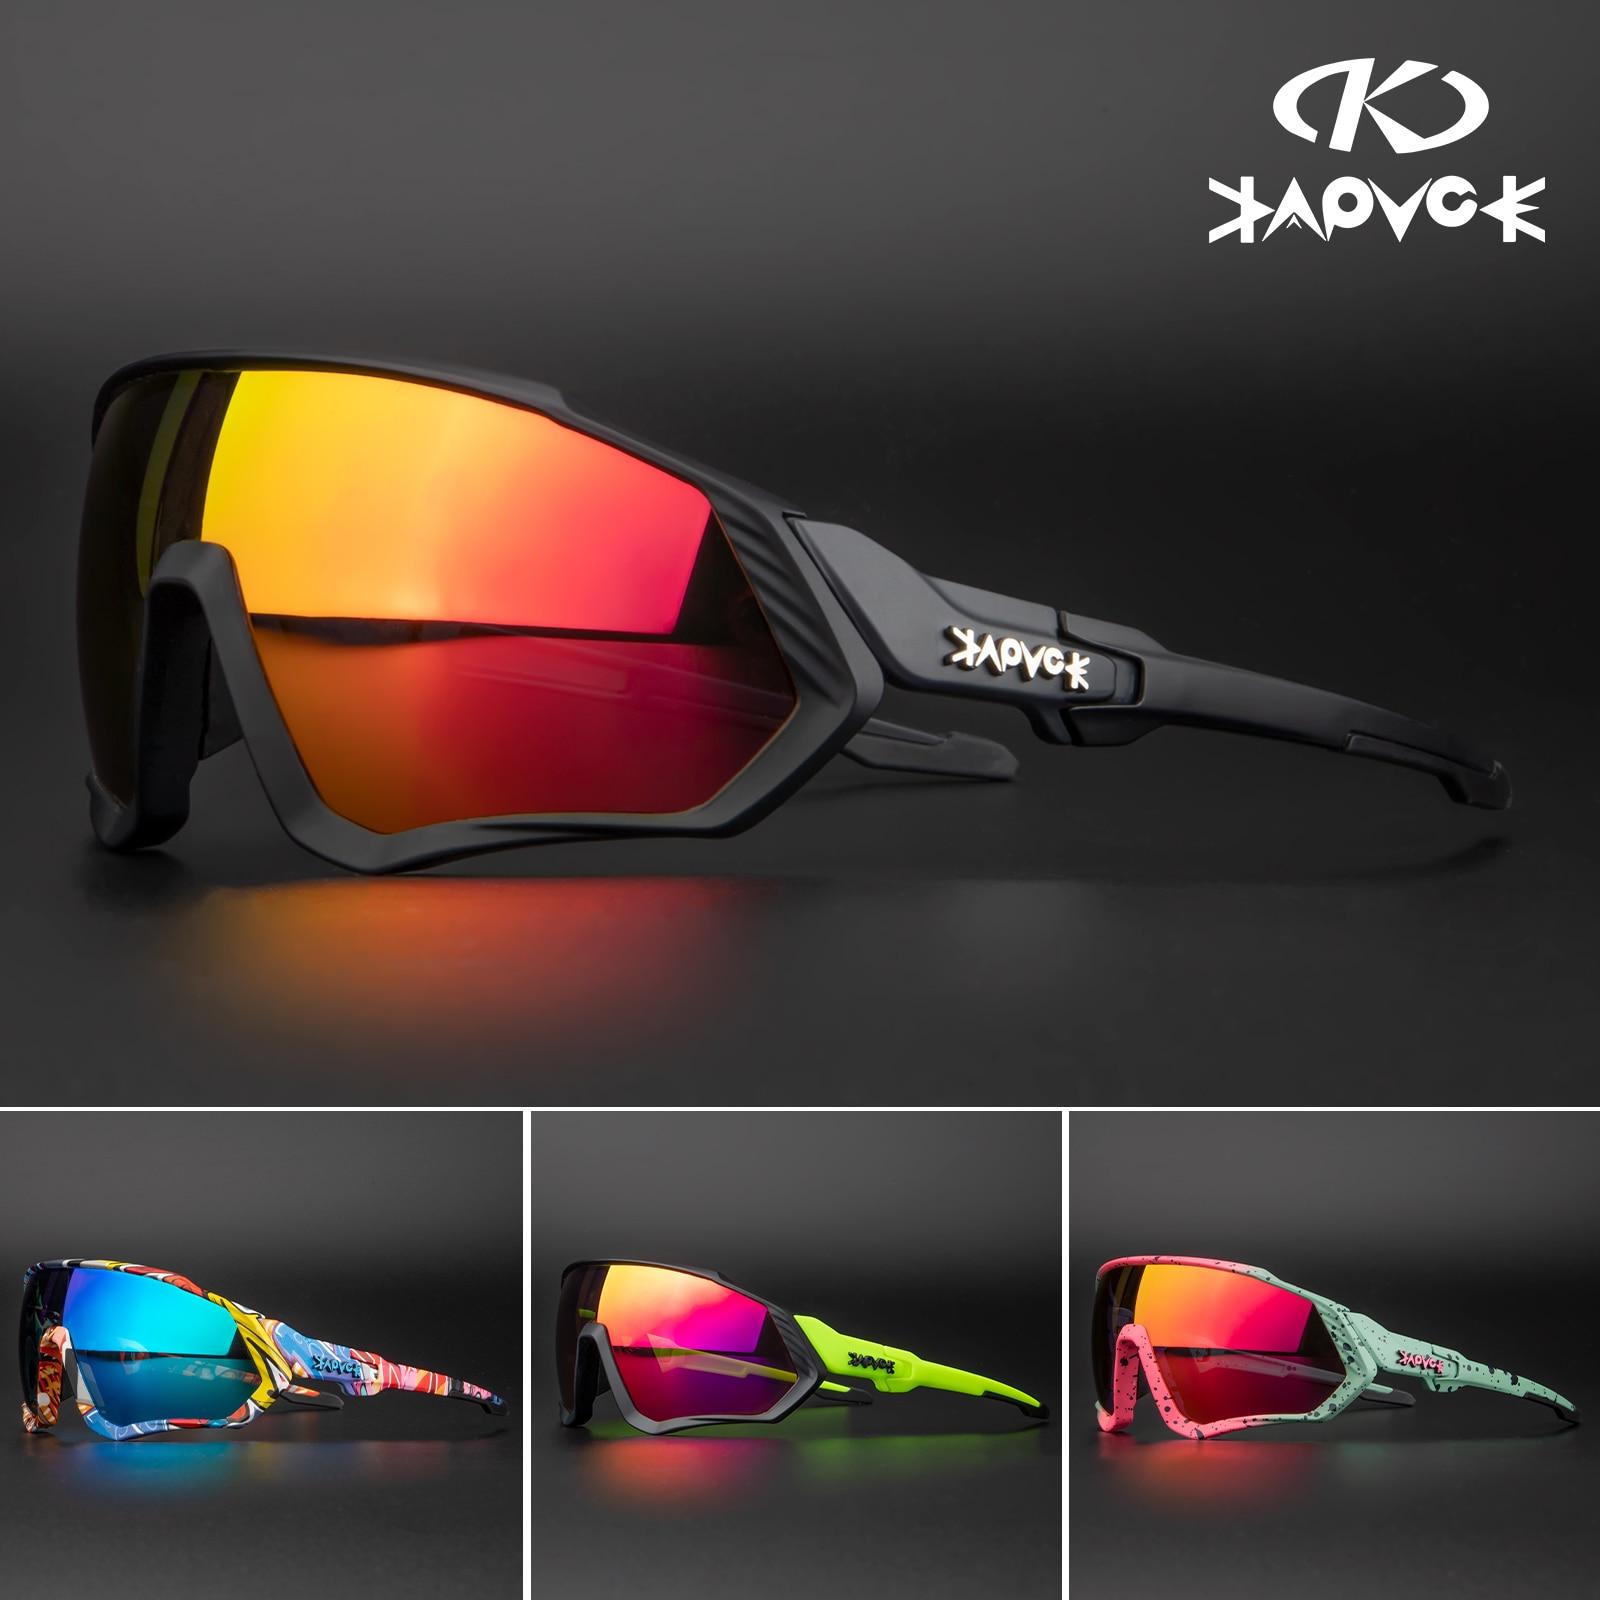 Riding Cycling Sunglasses Mtb Polarized Sports Cycling Glasses Goggles Bicycle Mountain Bike Glasses Men's Women Cycling Eyewear